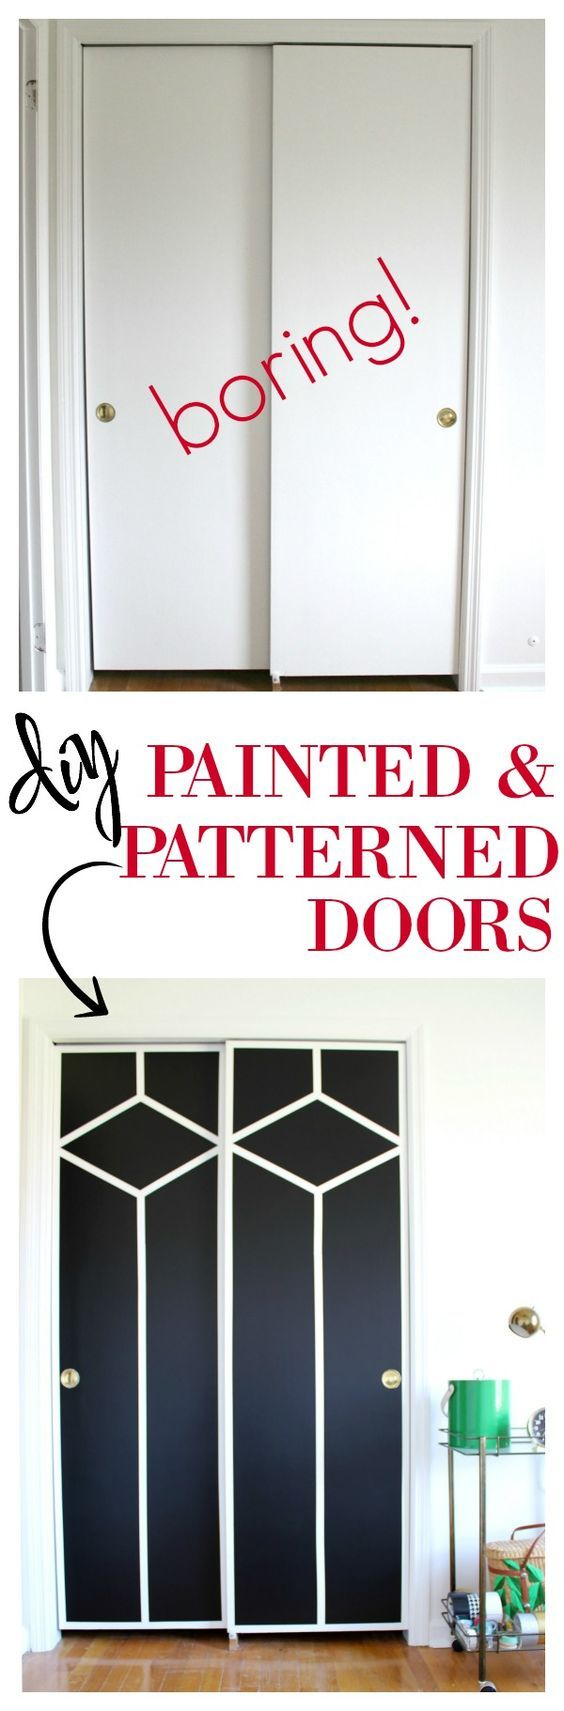 25+ Best Wood Sliding Closet Doors Ideas On Pinterest   Barn Doors For  Closets, Sliding Barn Door For Closet And A Barn